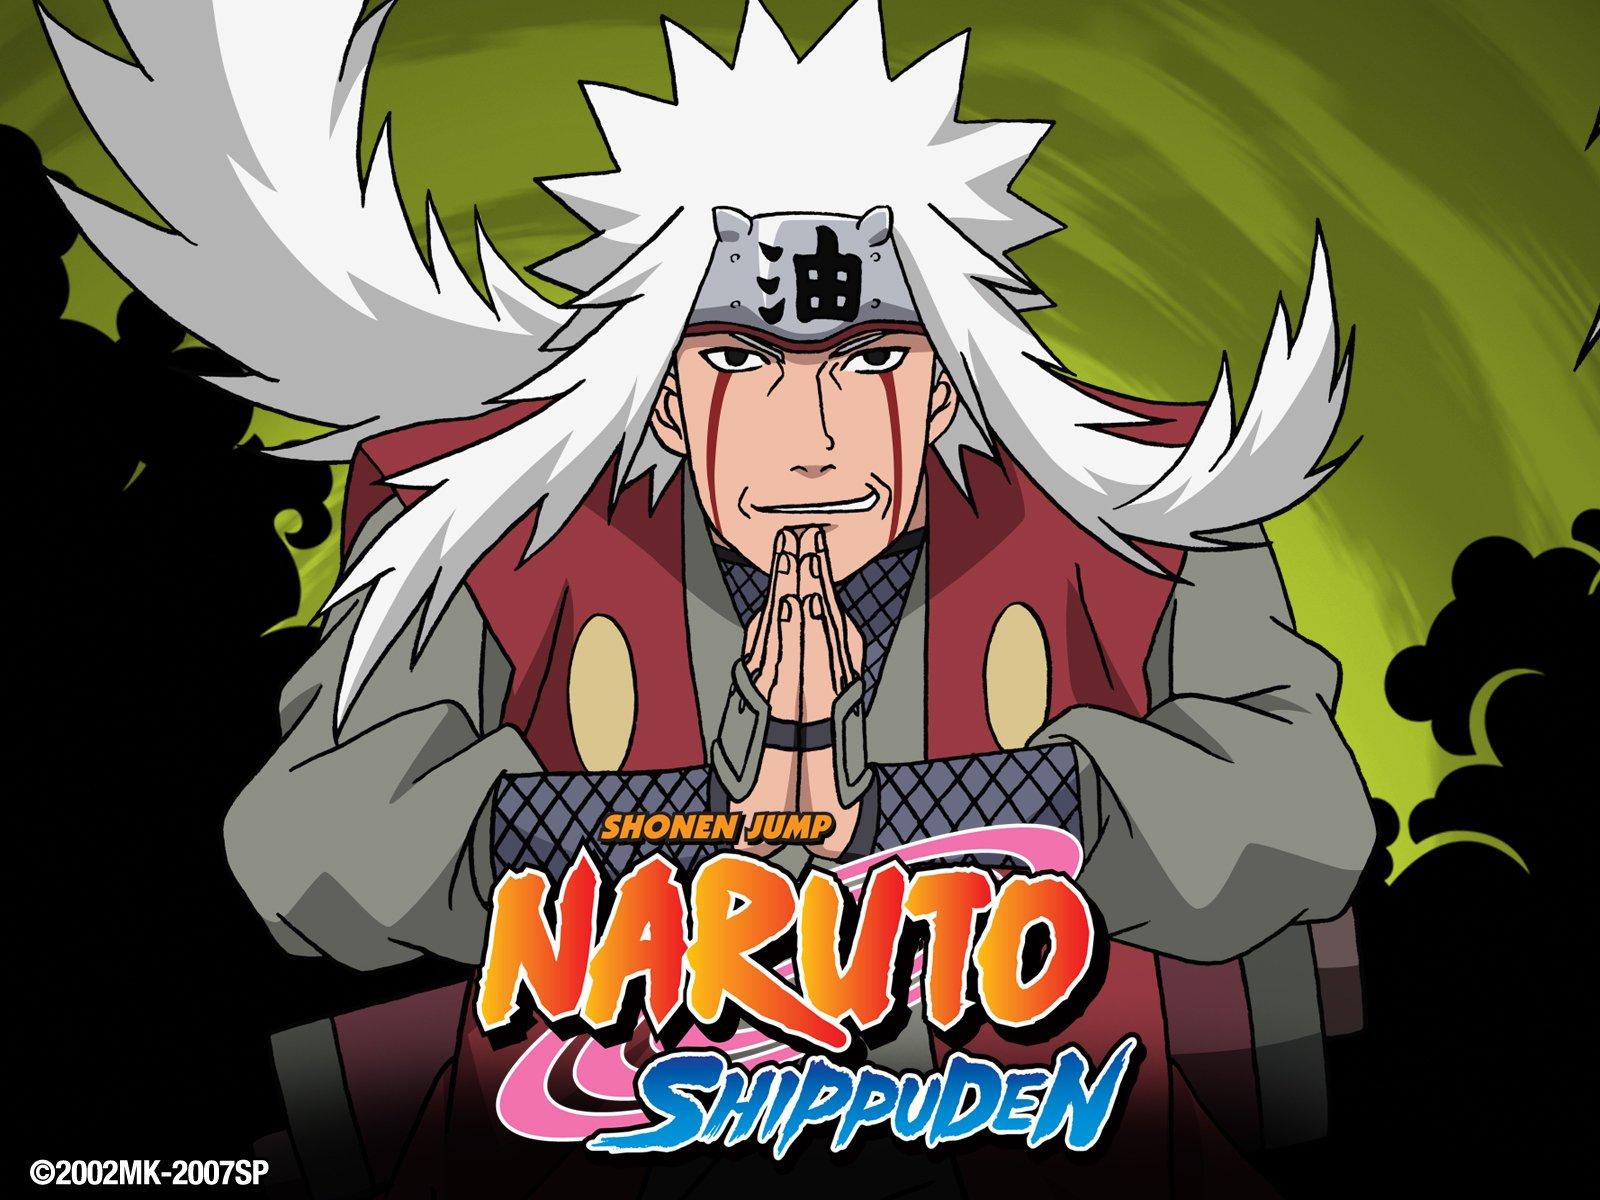 Watch Naruto Shippuden Uncut Season 8 Volume 1 | Prime Video